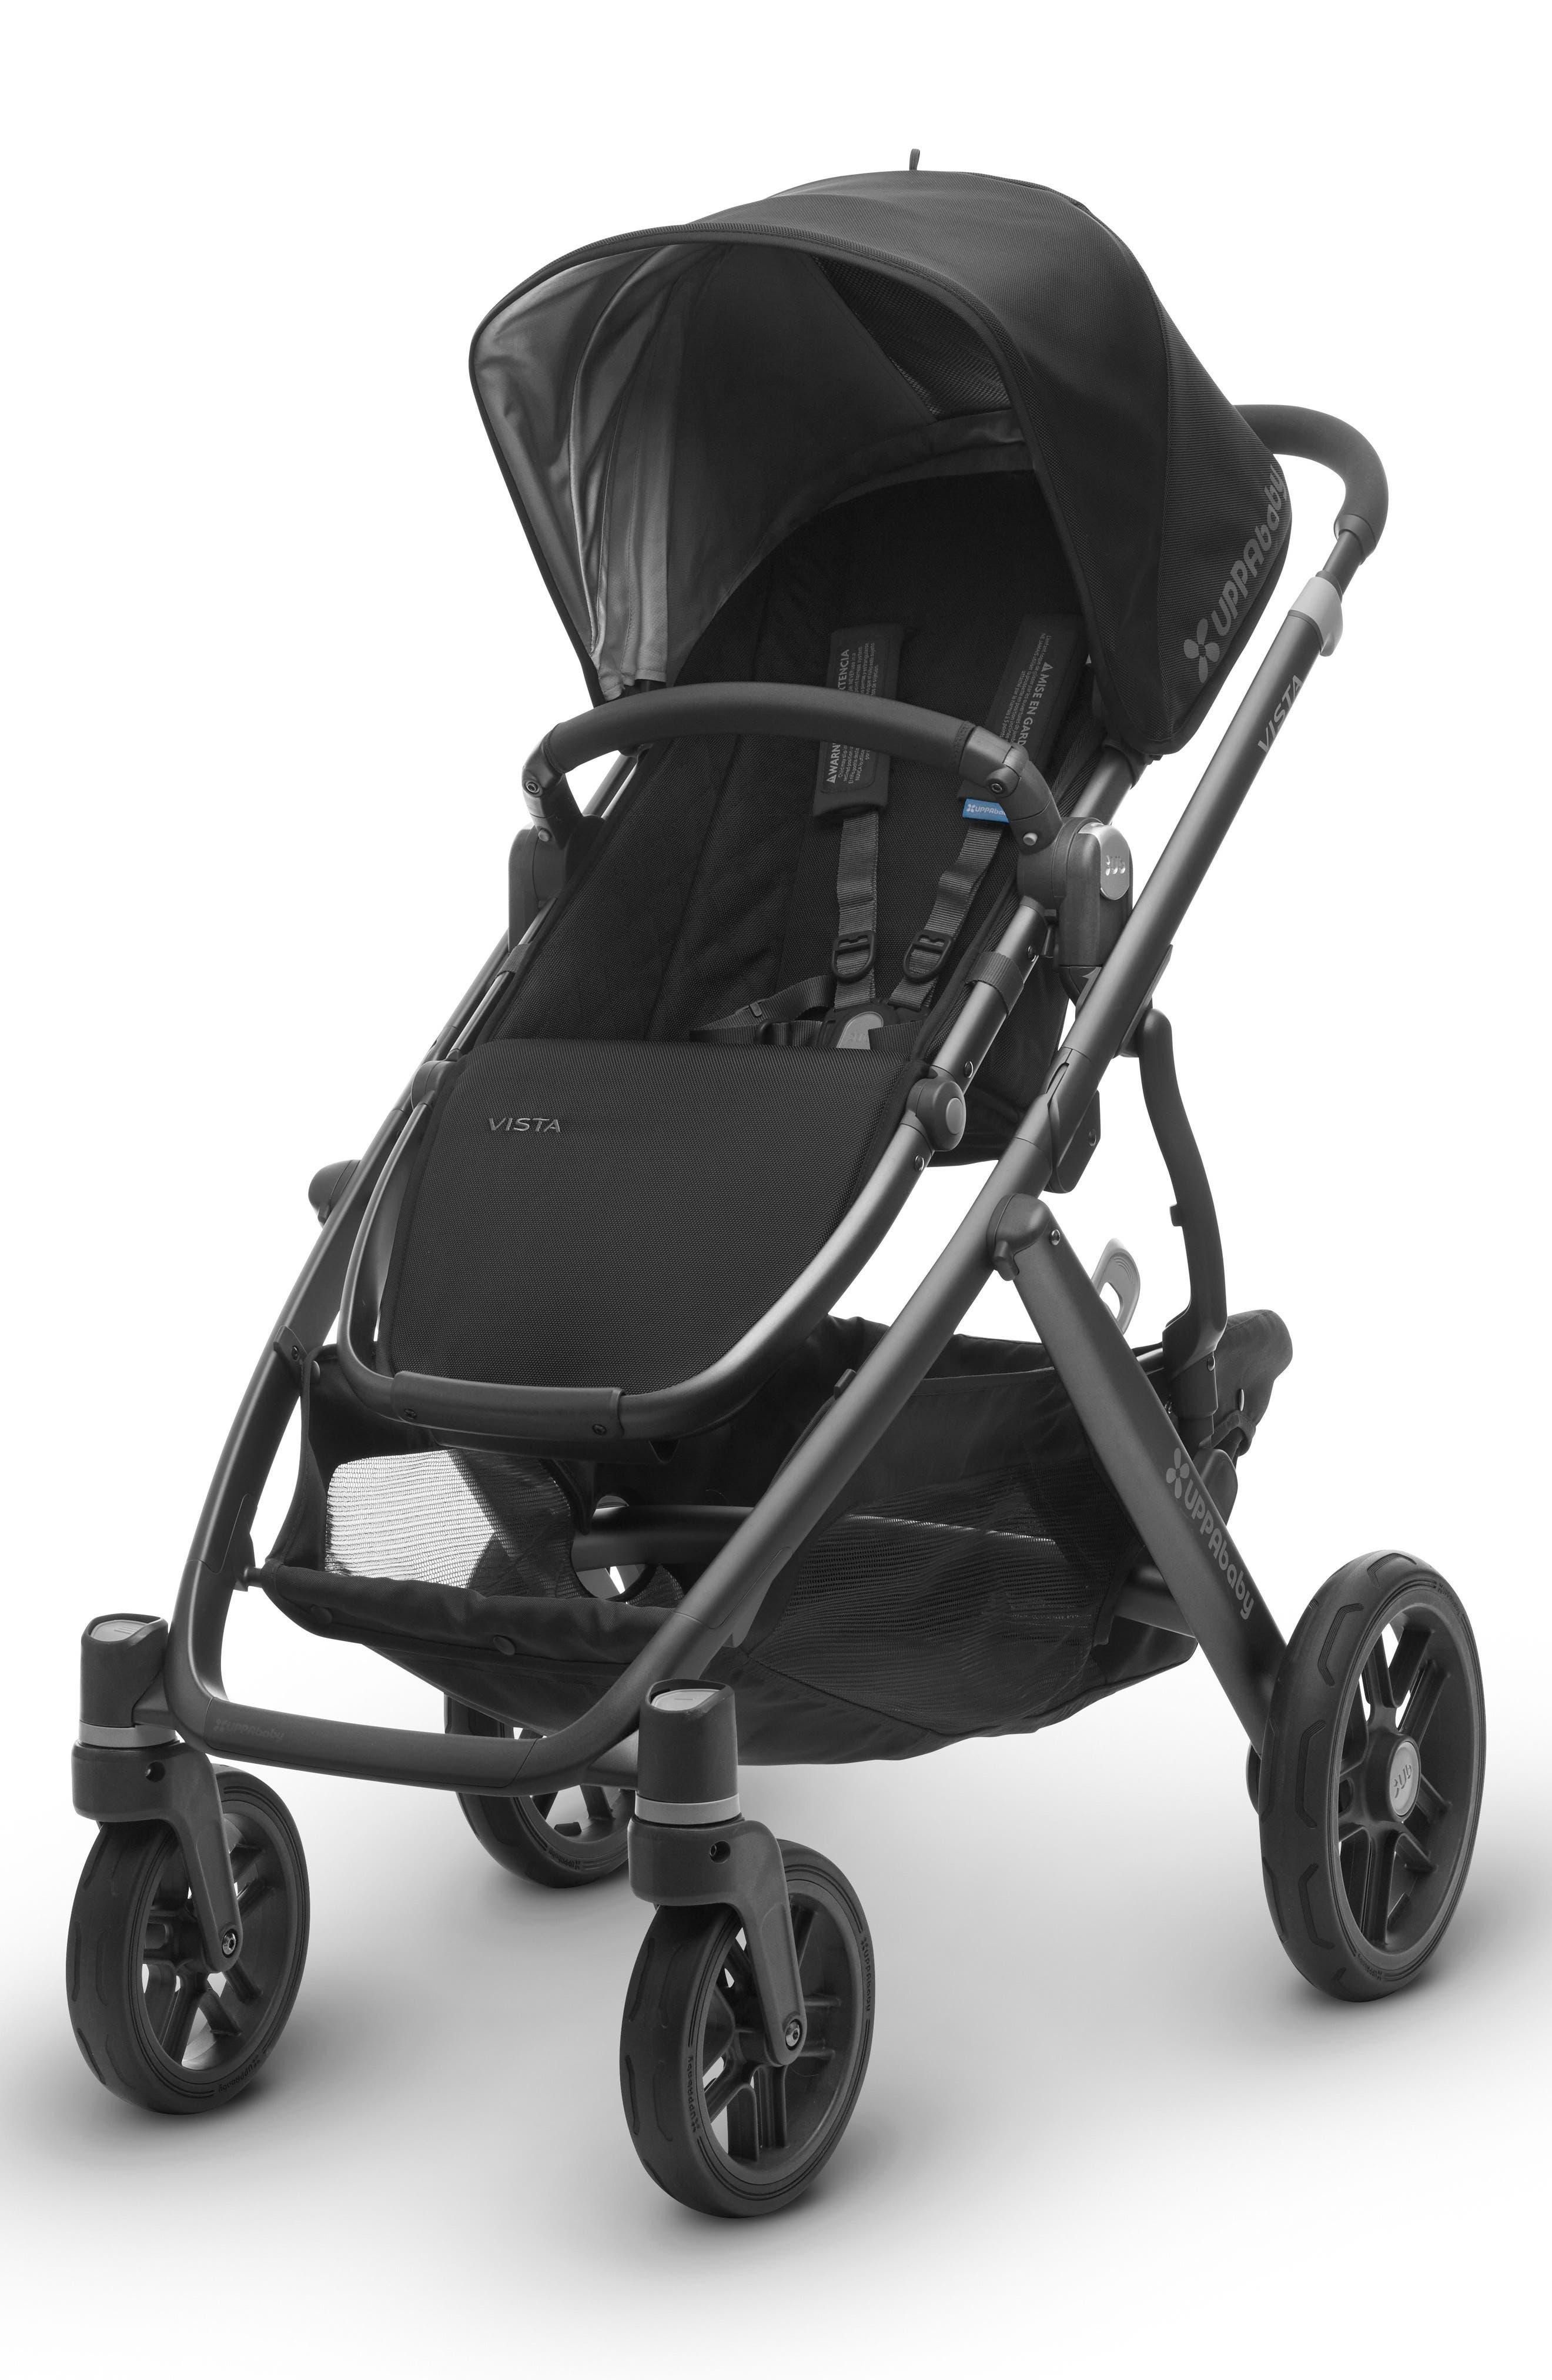 2017 VISTA Aluminum Frame Convertible Stroller with Bassinet & Toddler Seat,                         Main,                         color, 001